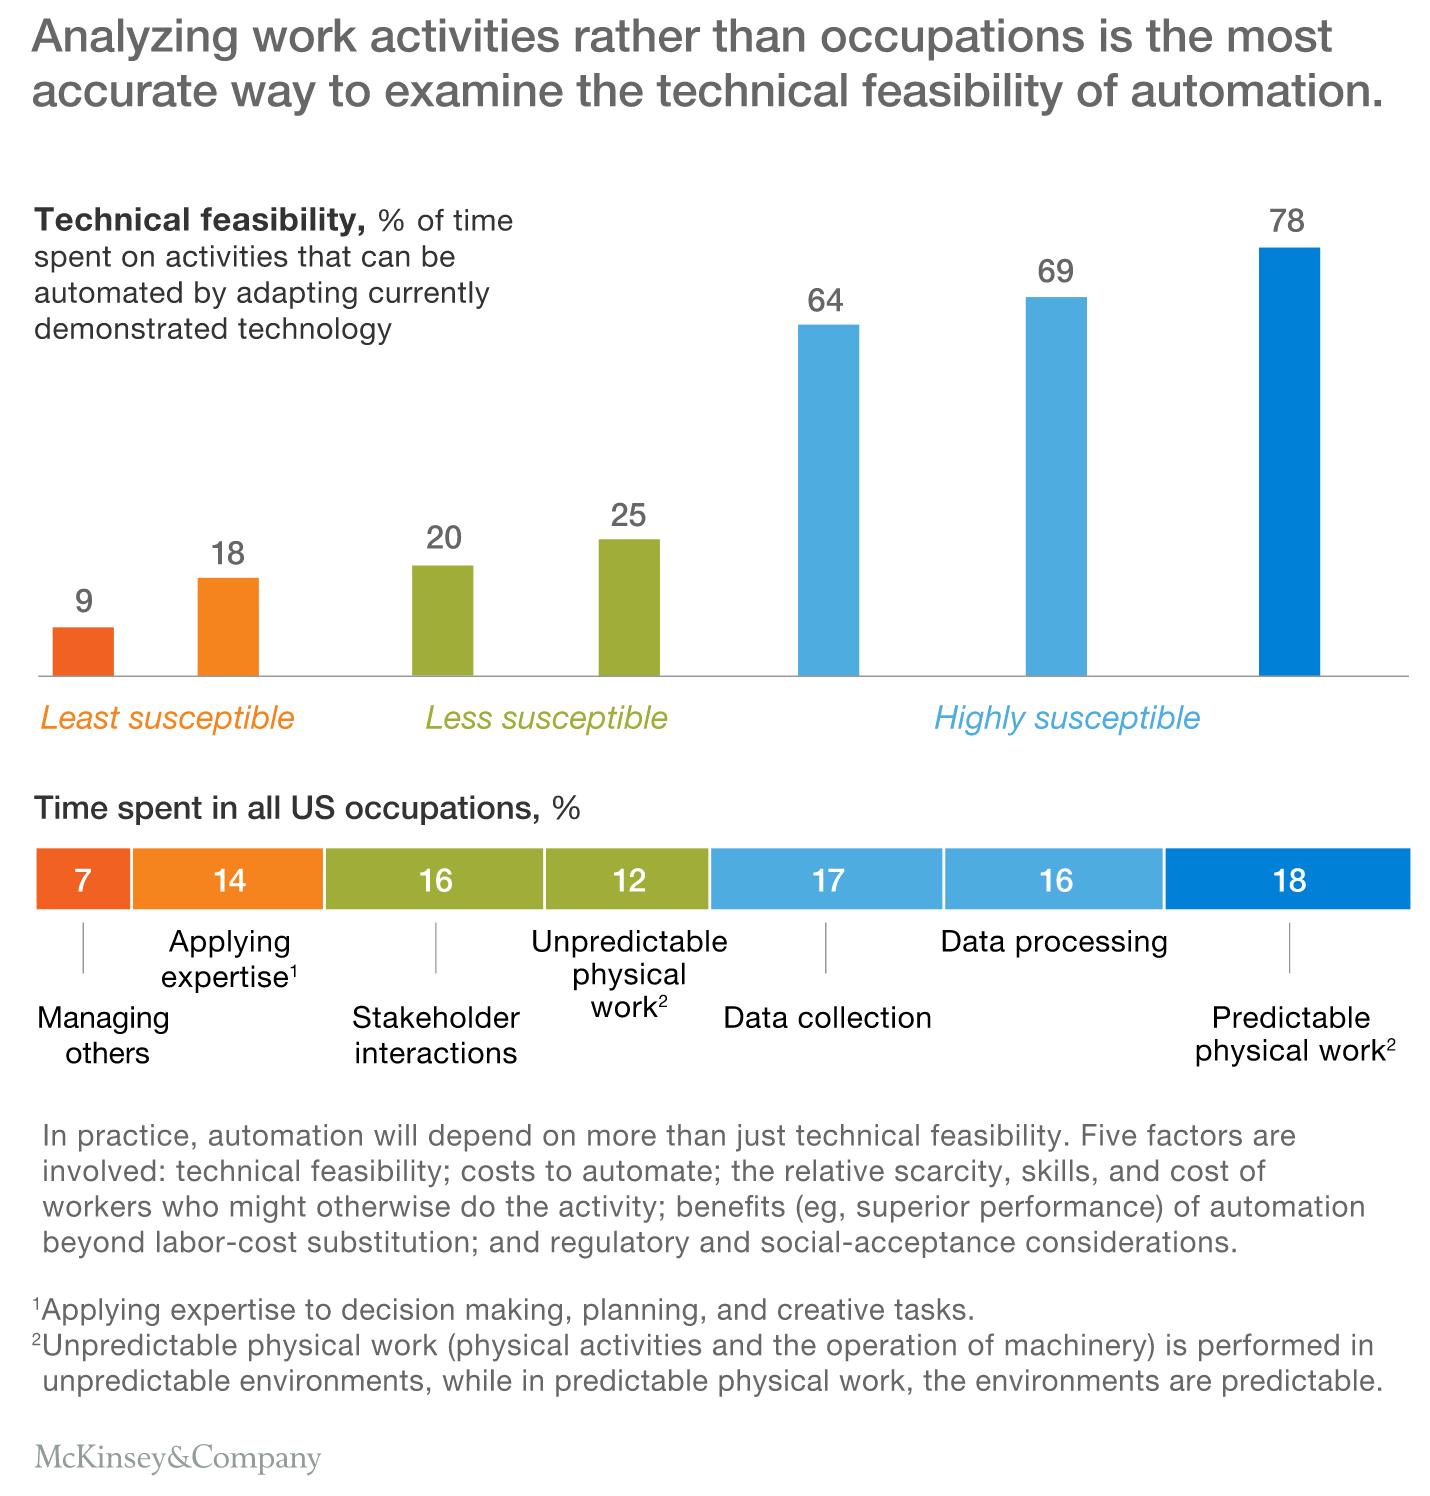 McKinsey Automation